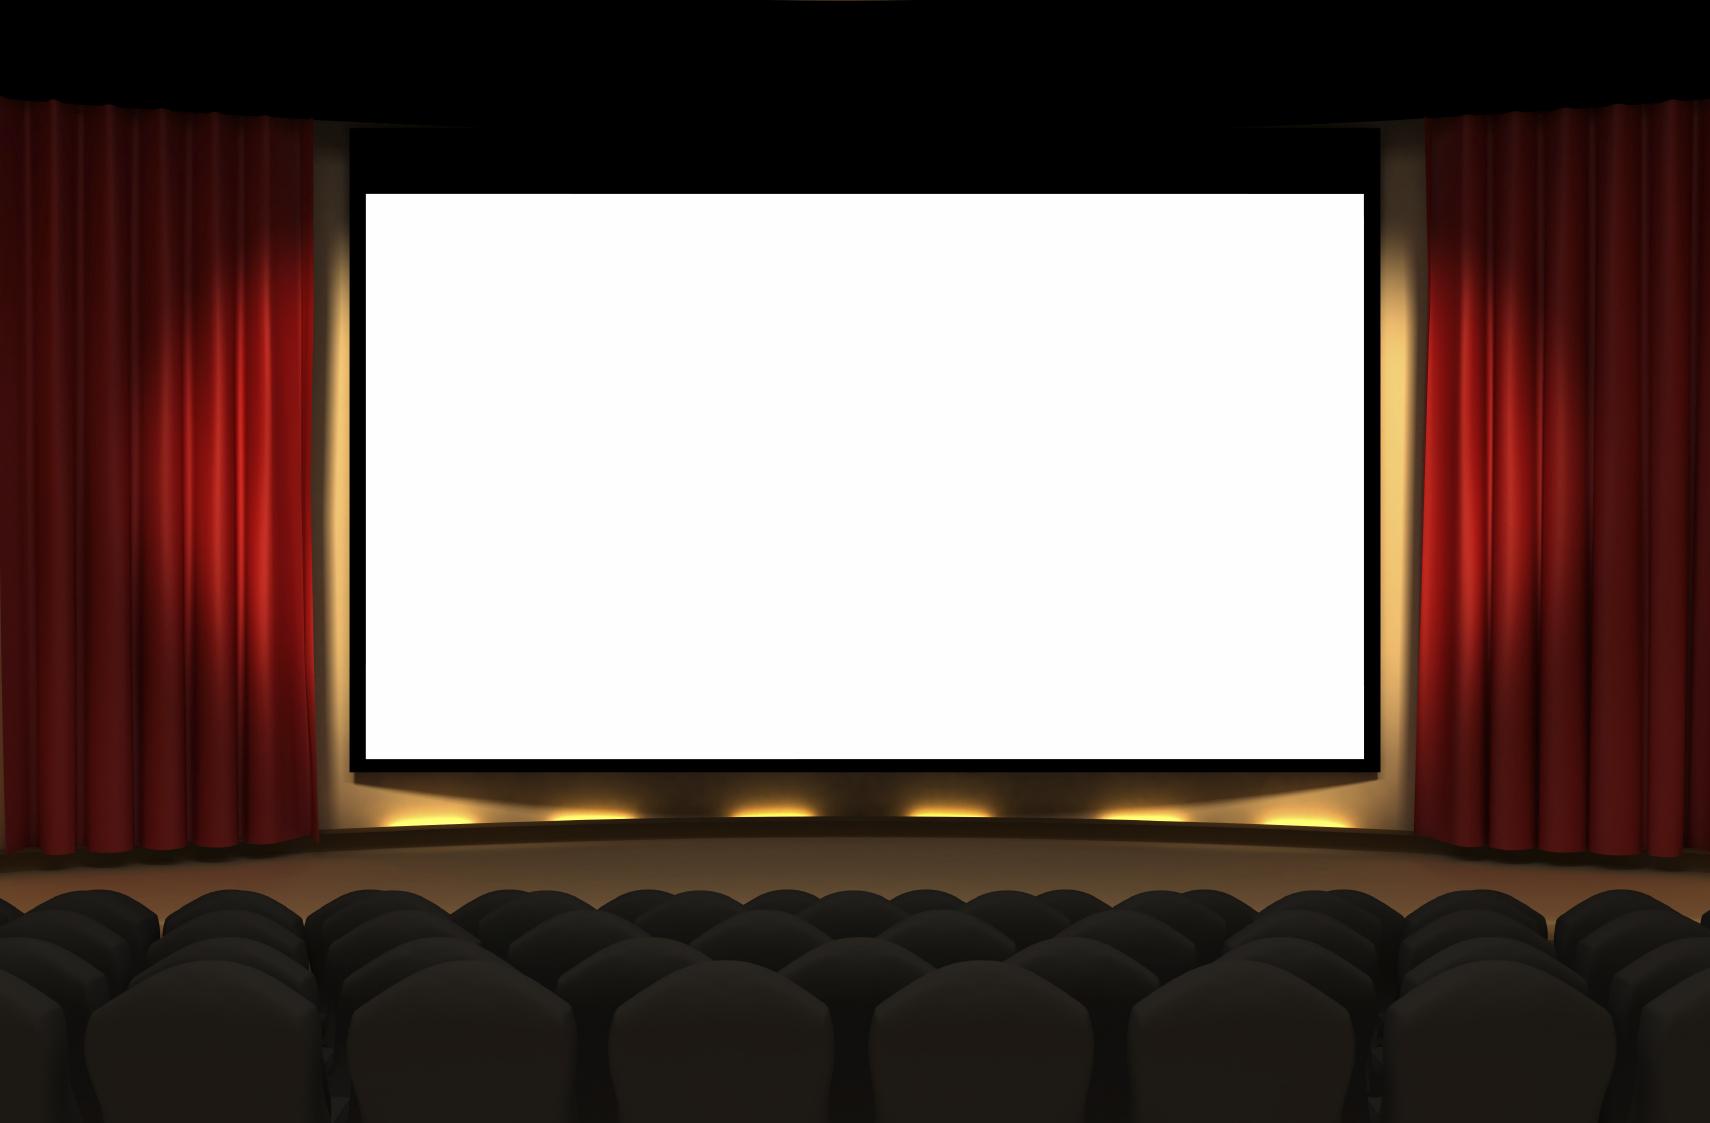 Theater Clipart Free Clipart .-Theater clipart free clipart .-19